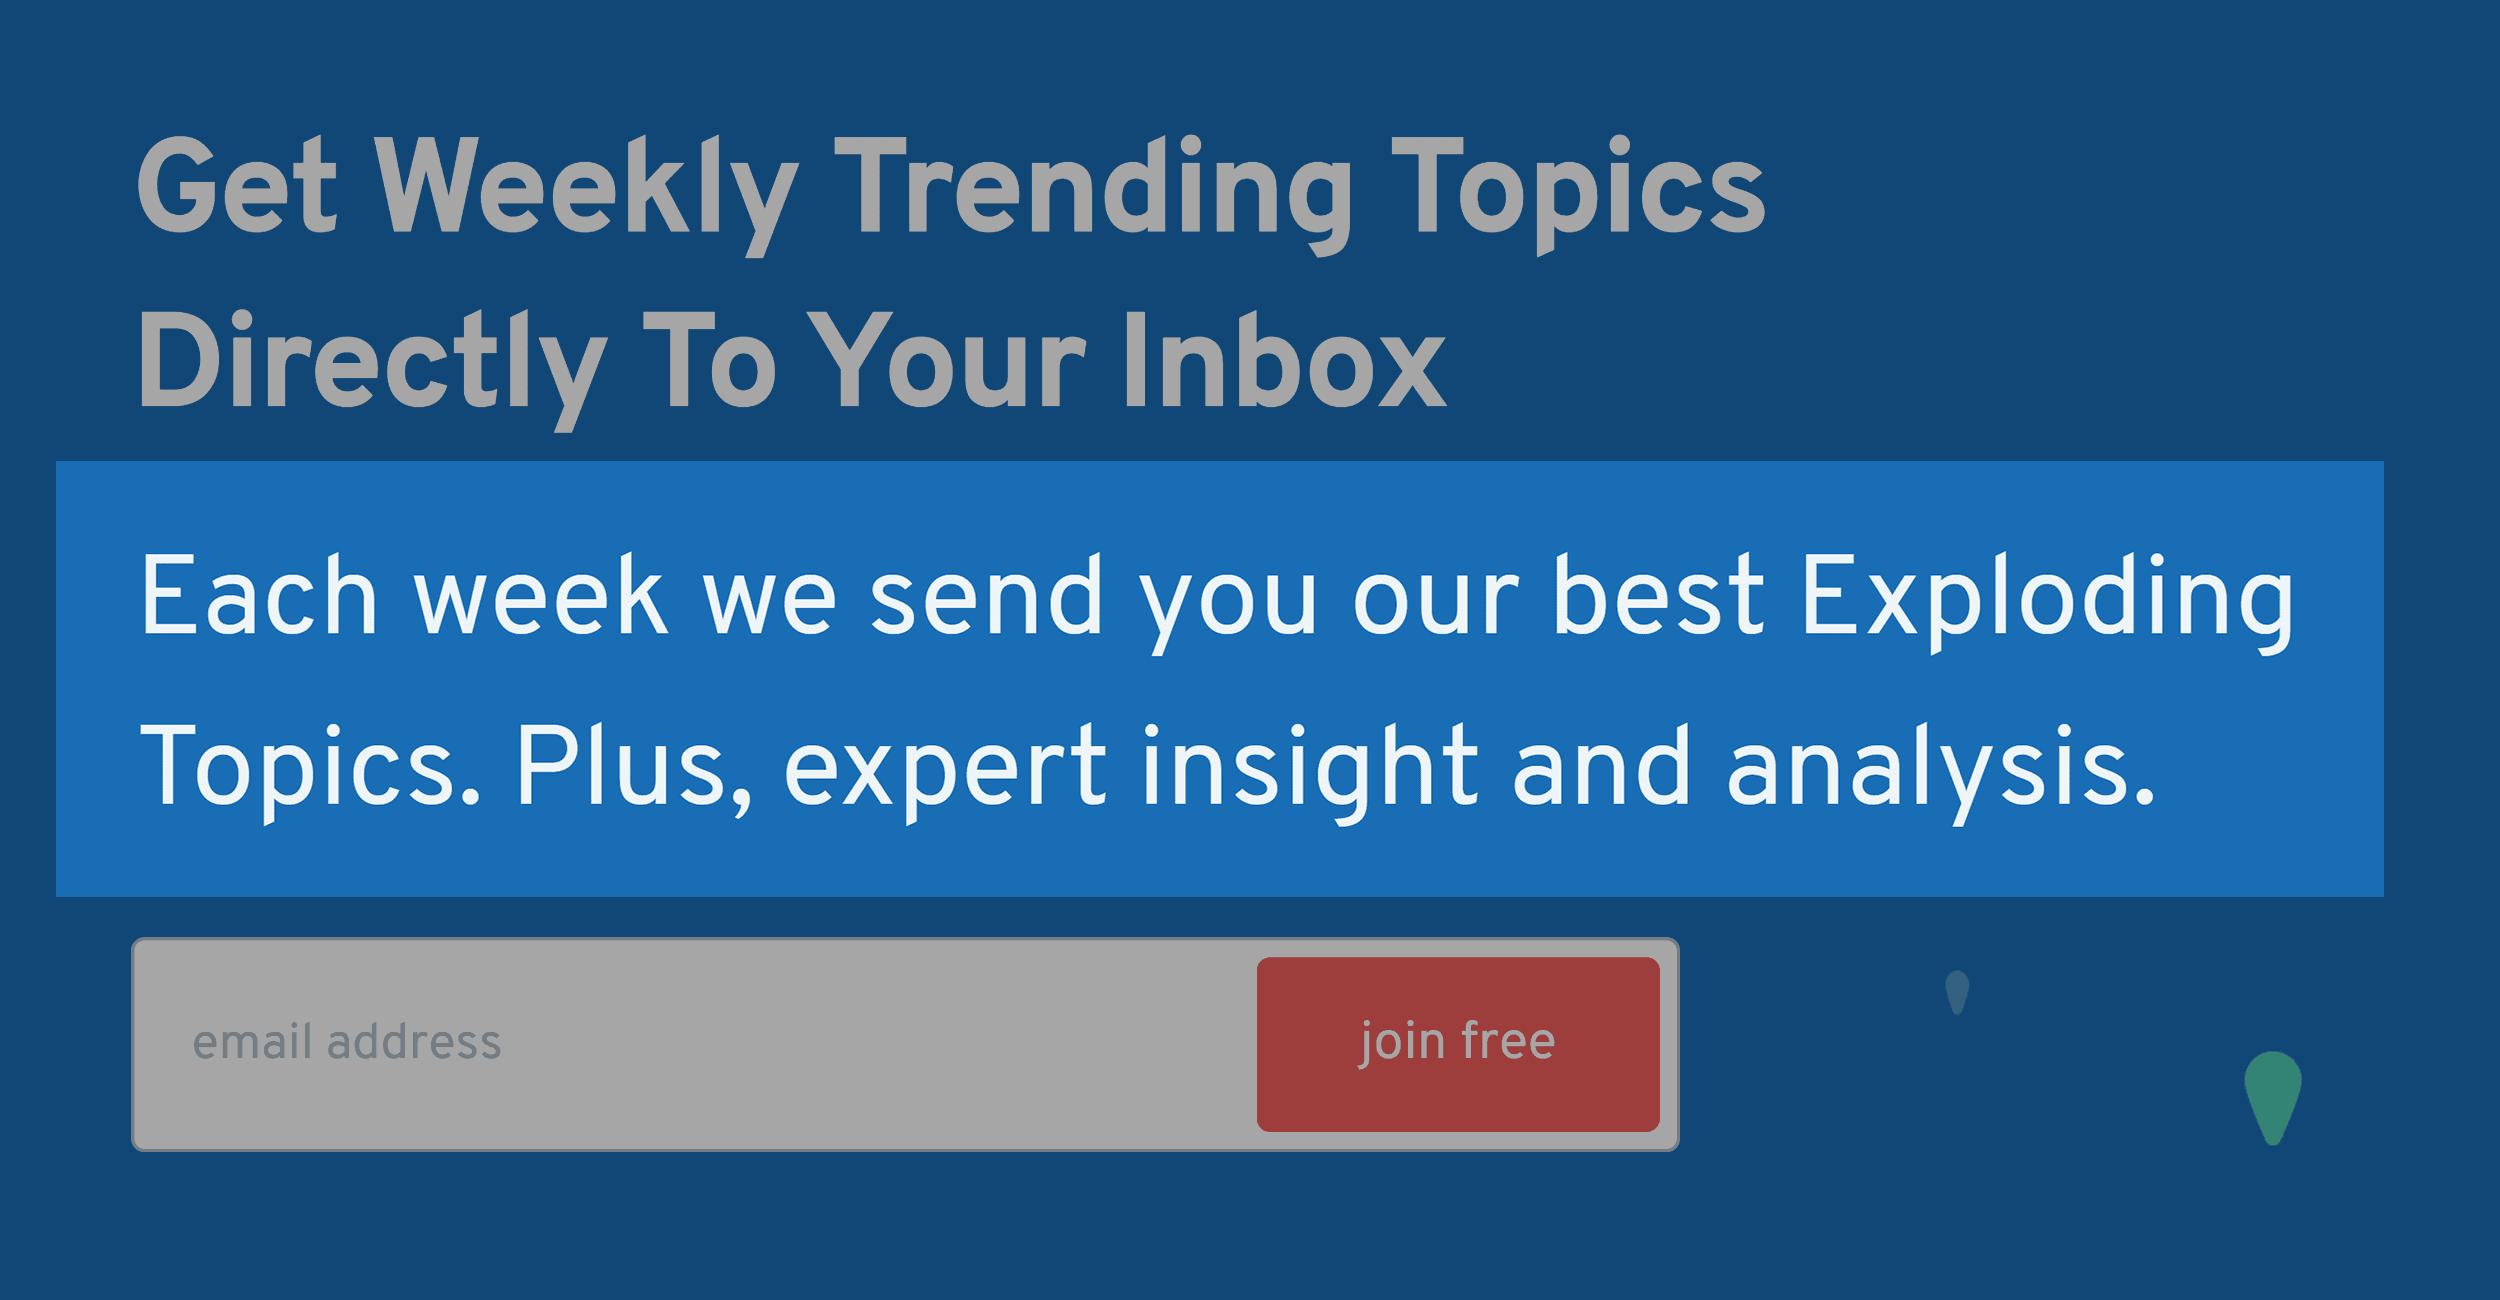 Explodingtopics – Newsletter Signup Subheadline